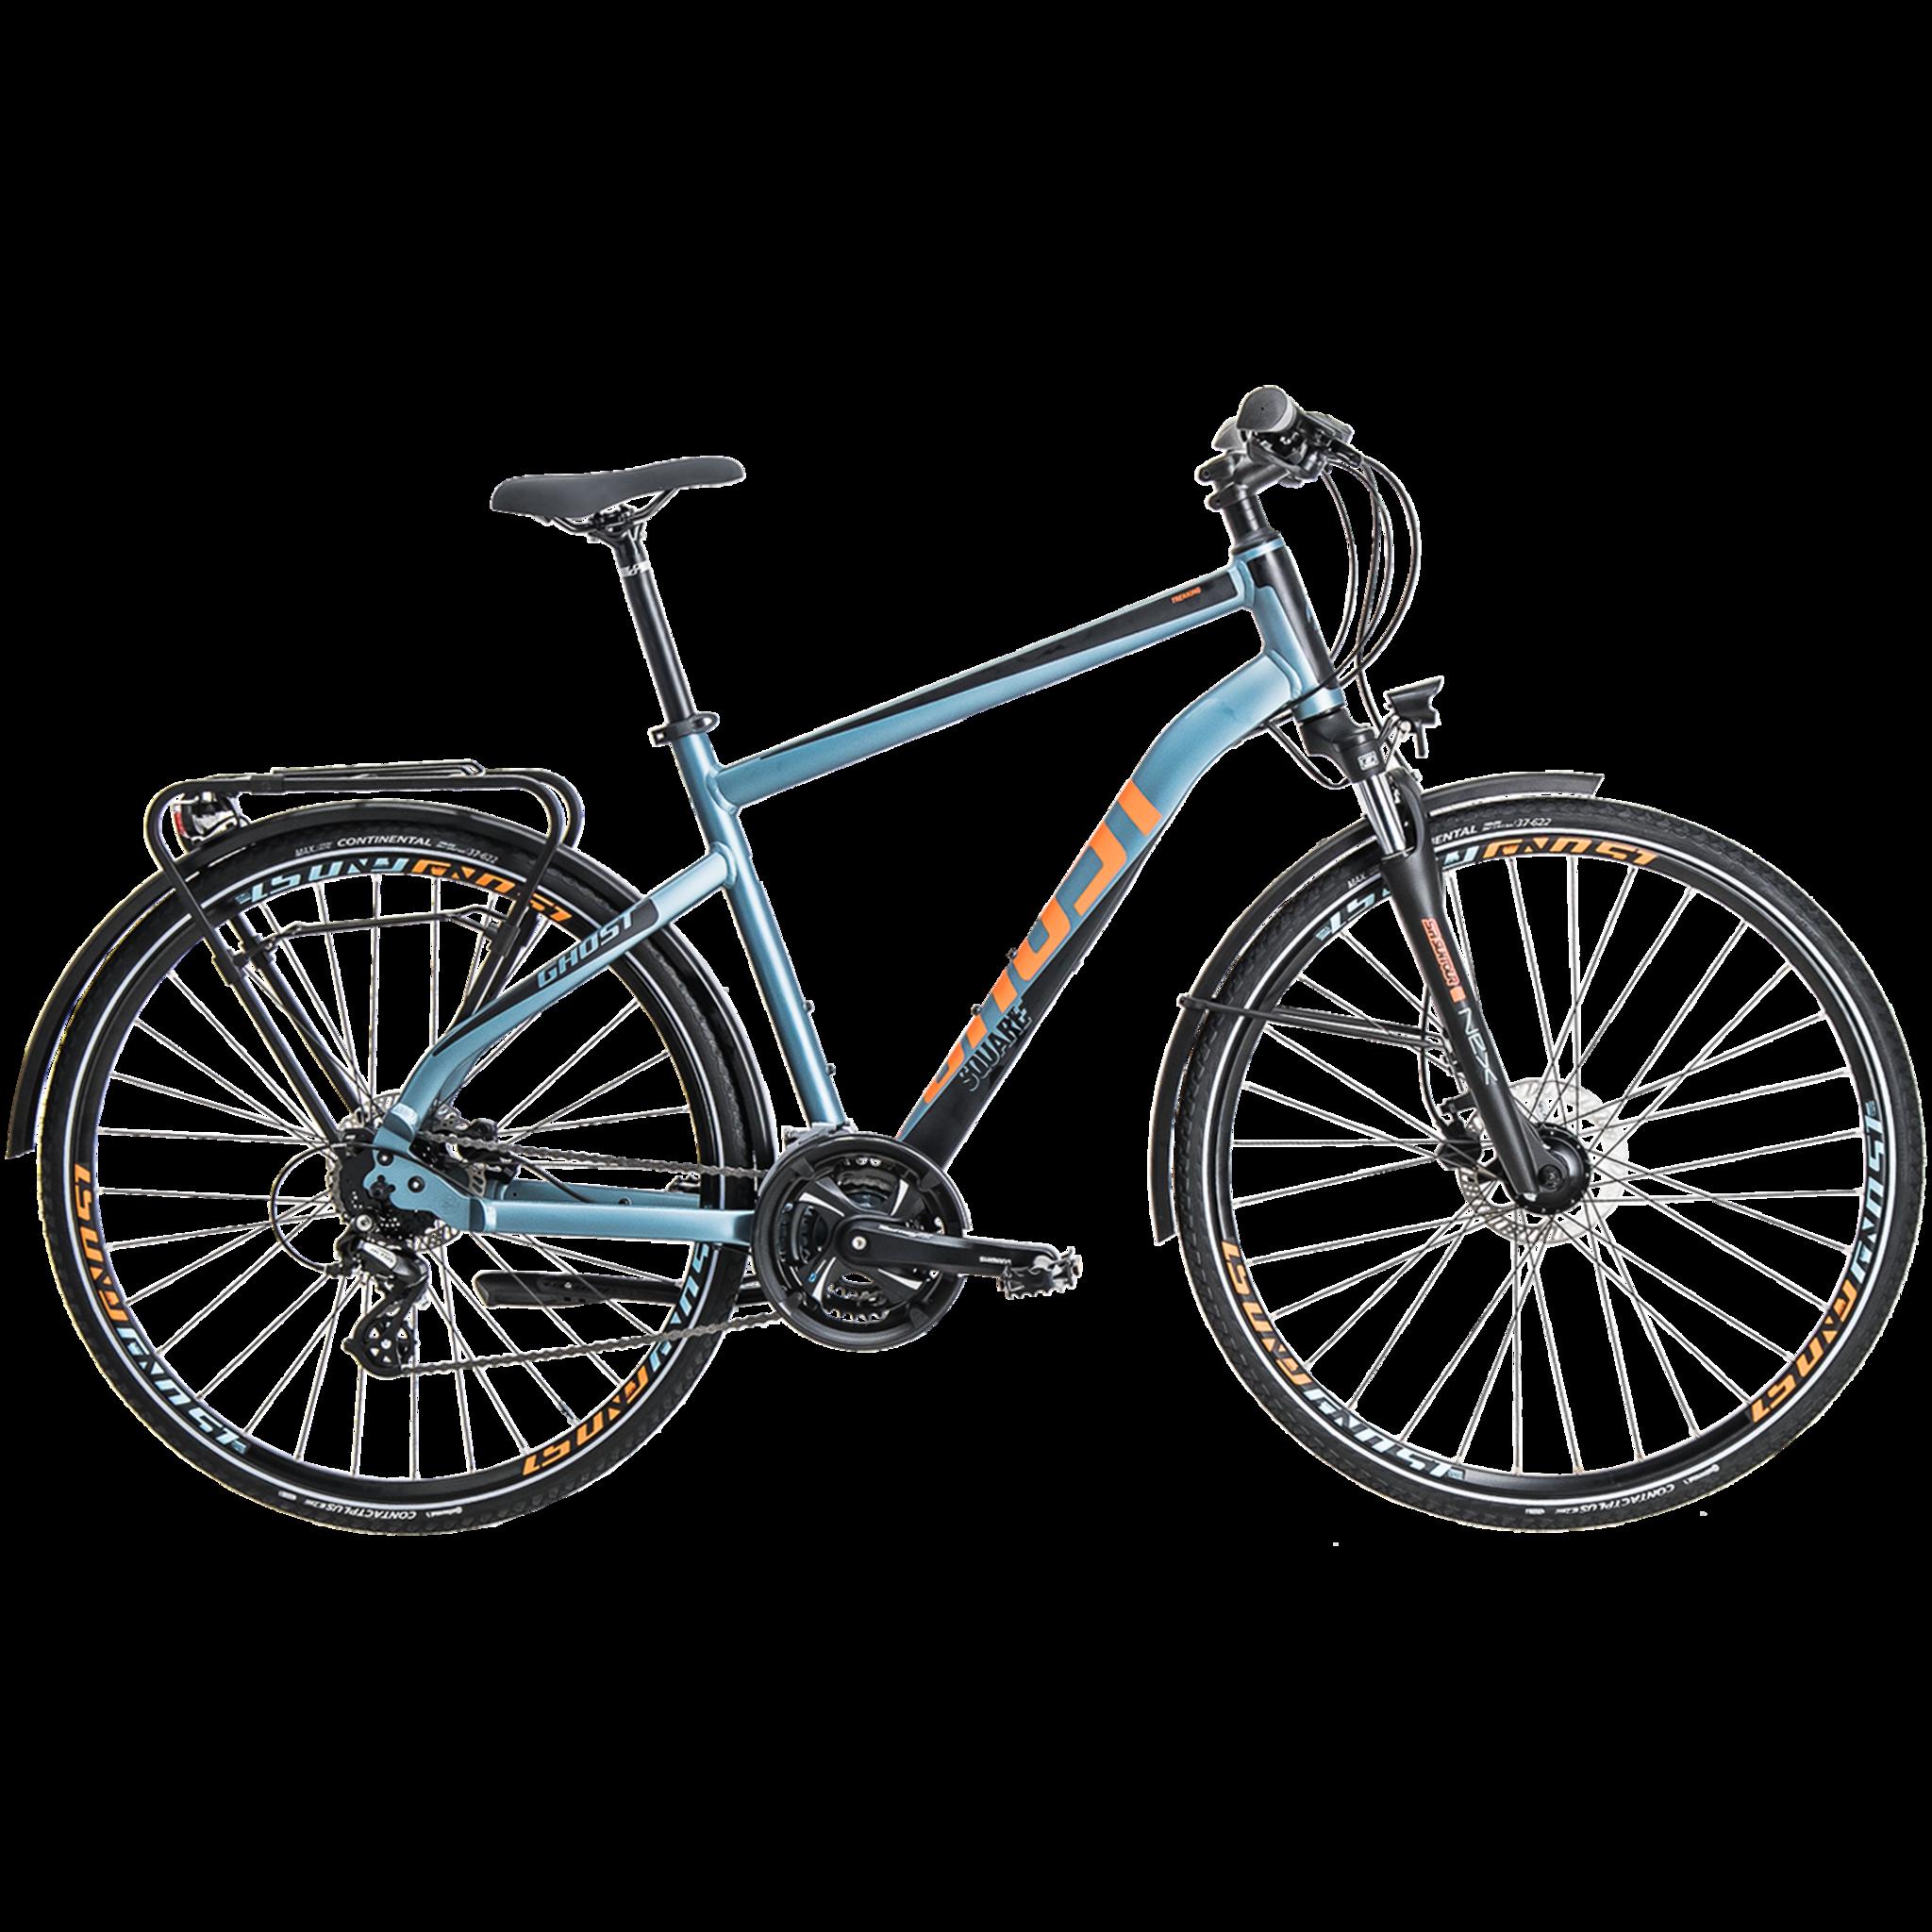 Square Trekking 2,8 20, tur- og pendlercykel, herre, Blå | city-cykel